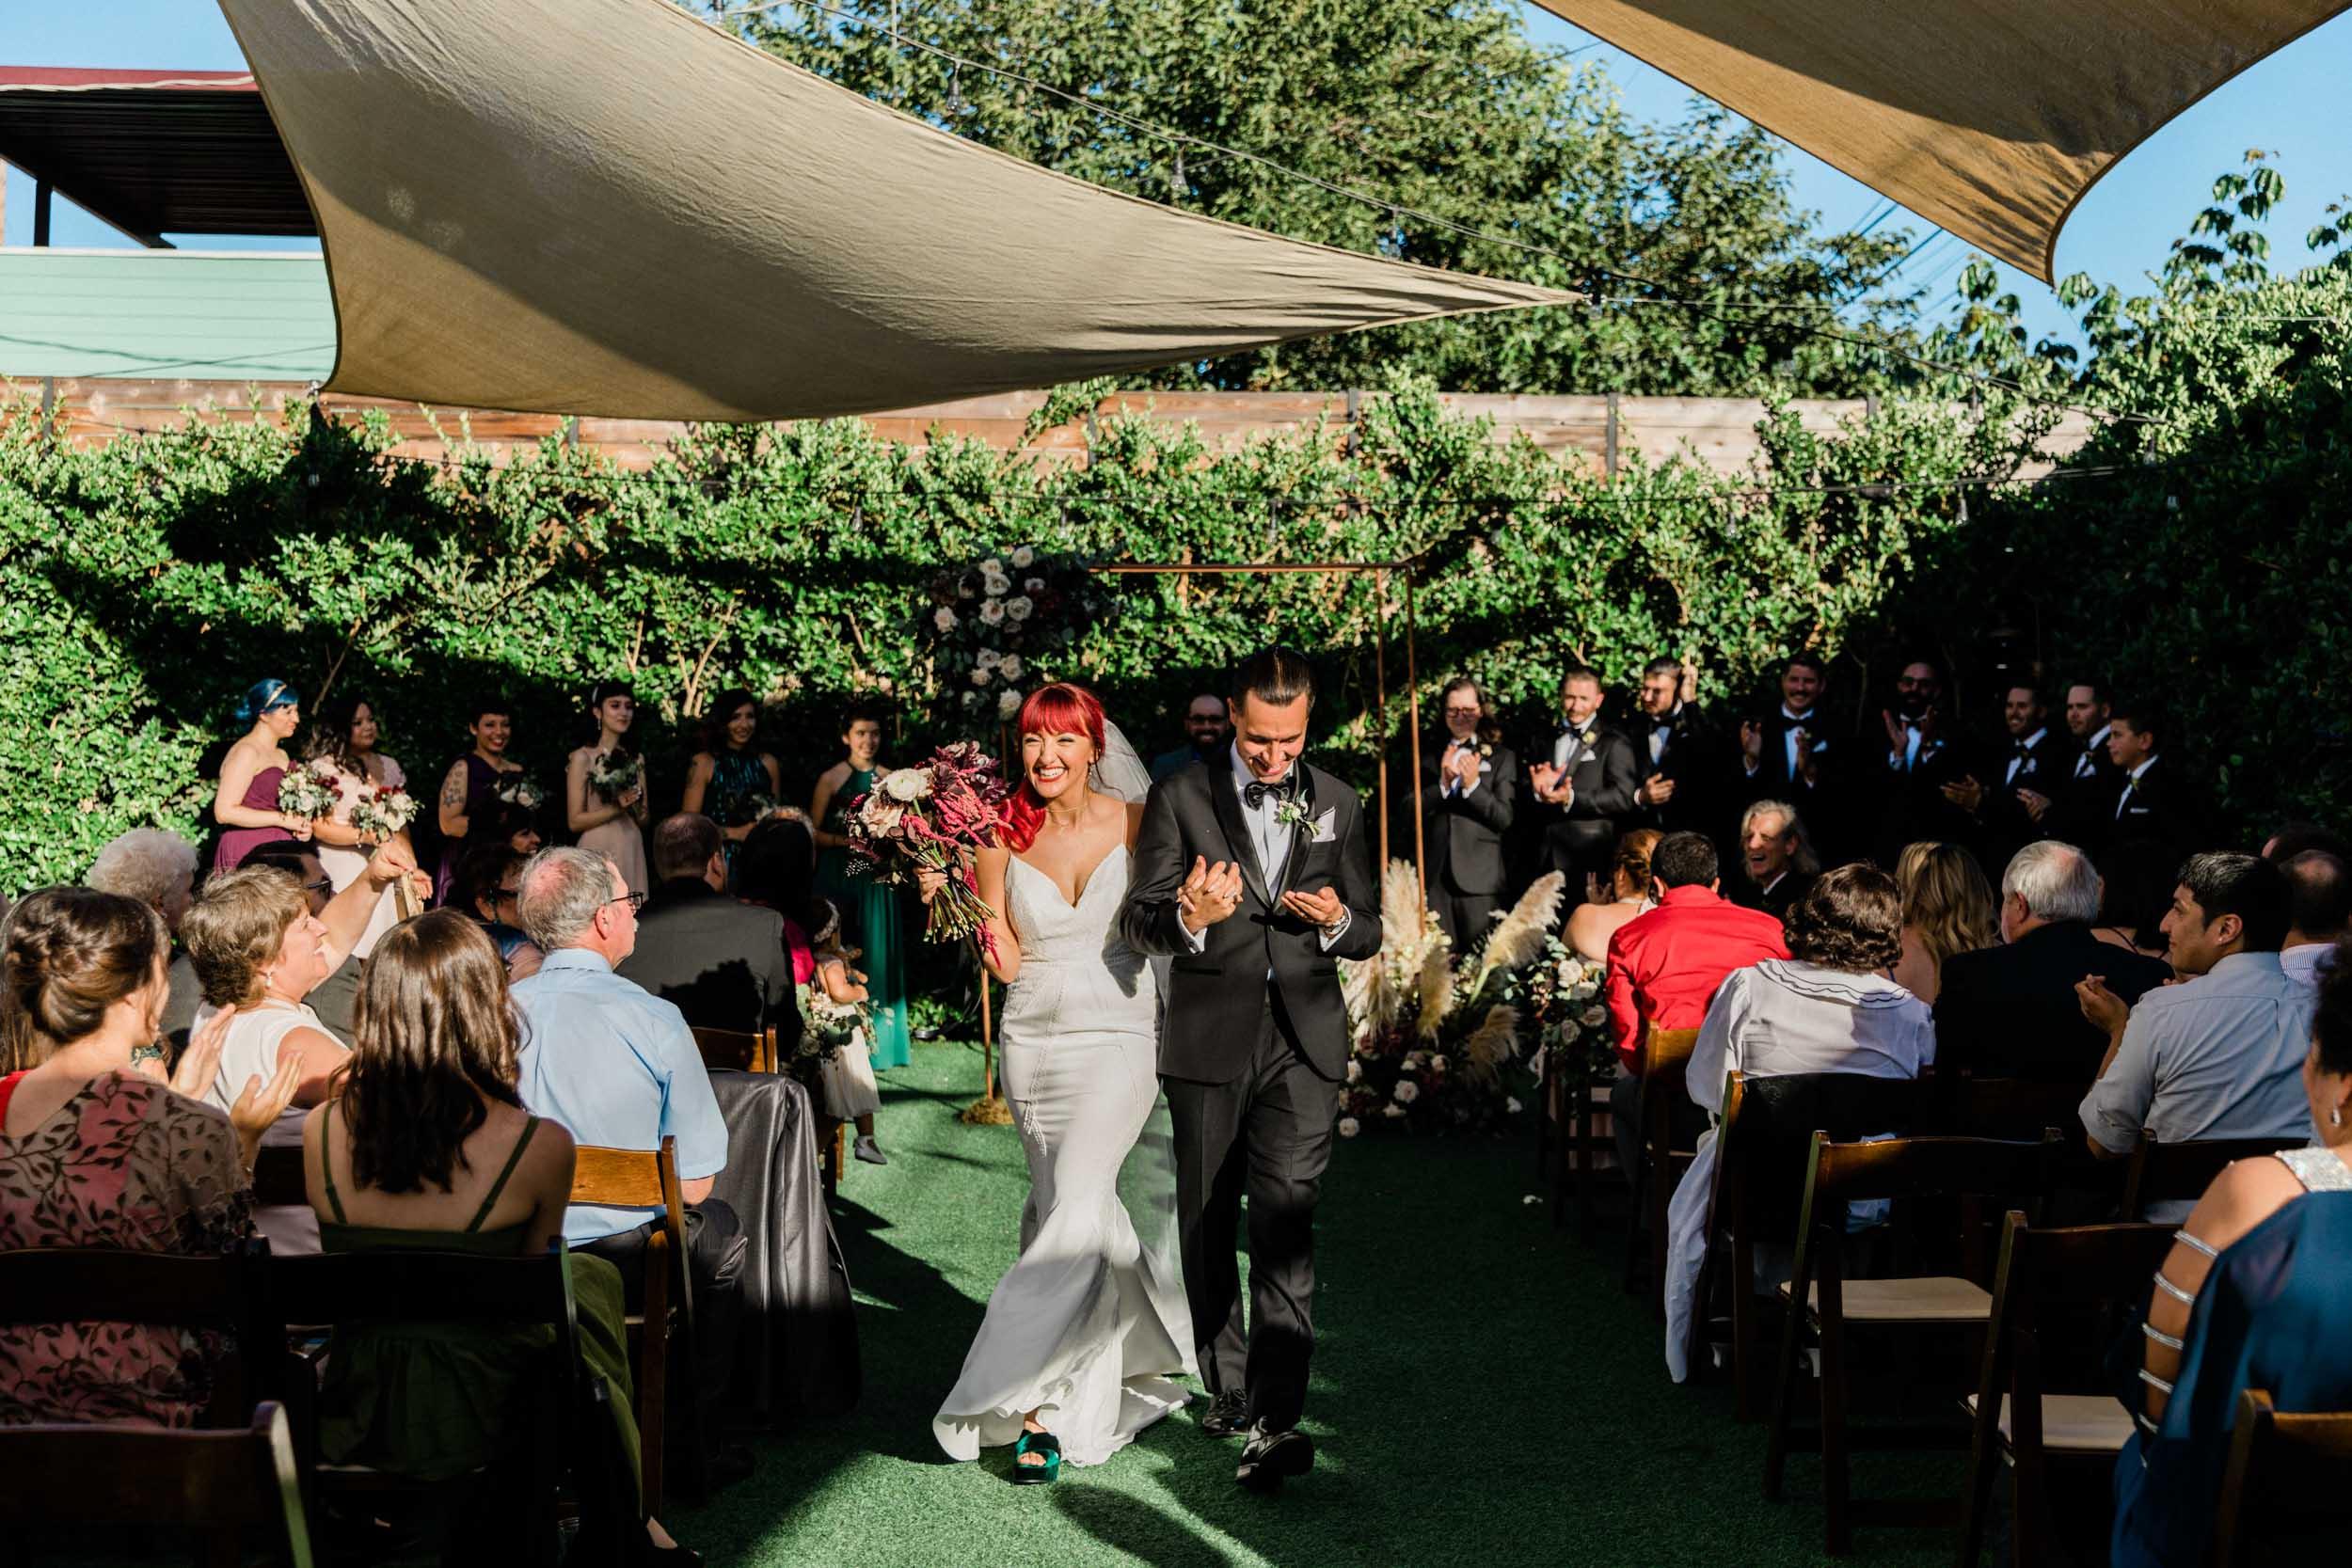 BKM-Photography-Los-Angeles-Highland-Park-York-Manor-Wedding-Photography-0730.jpg